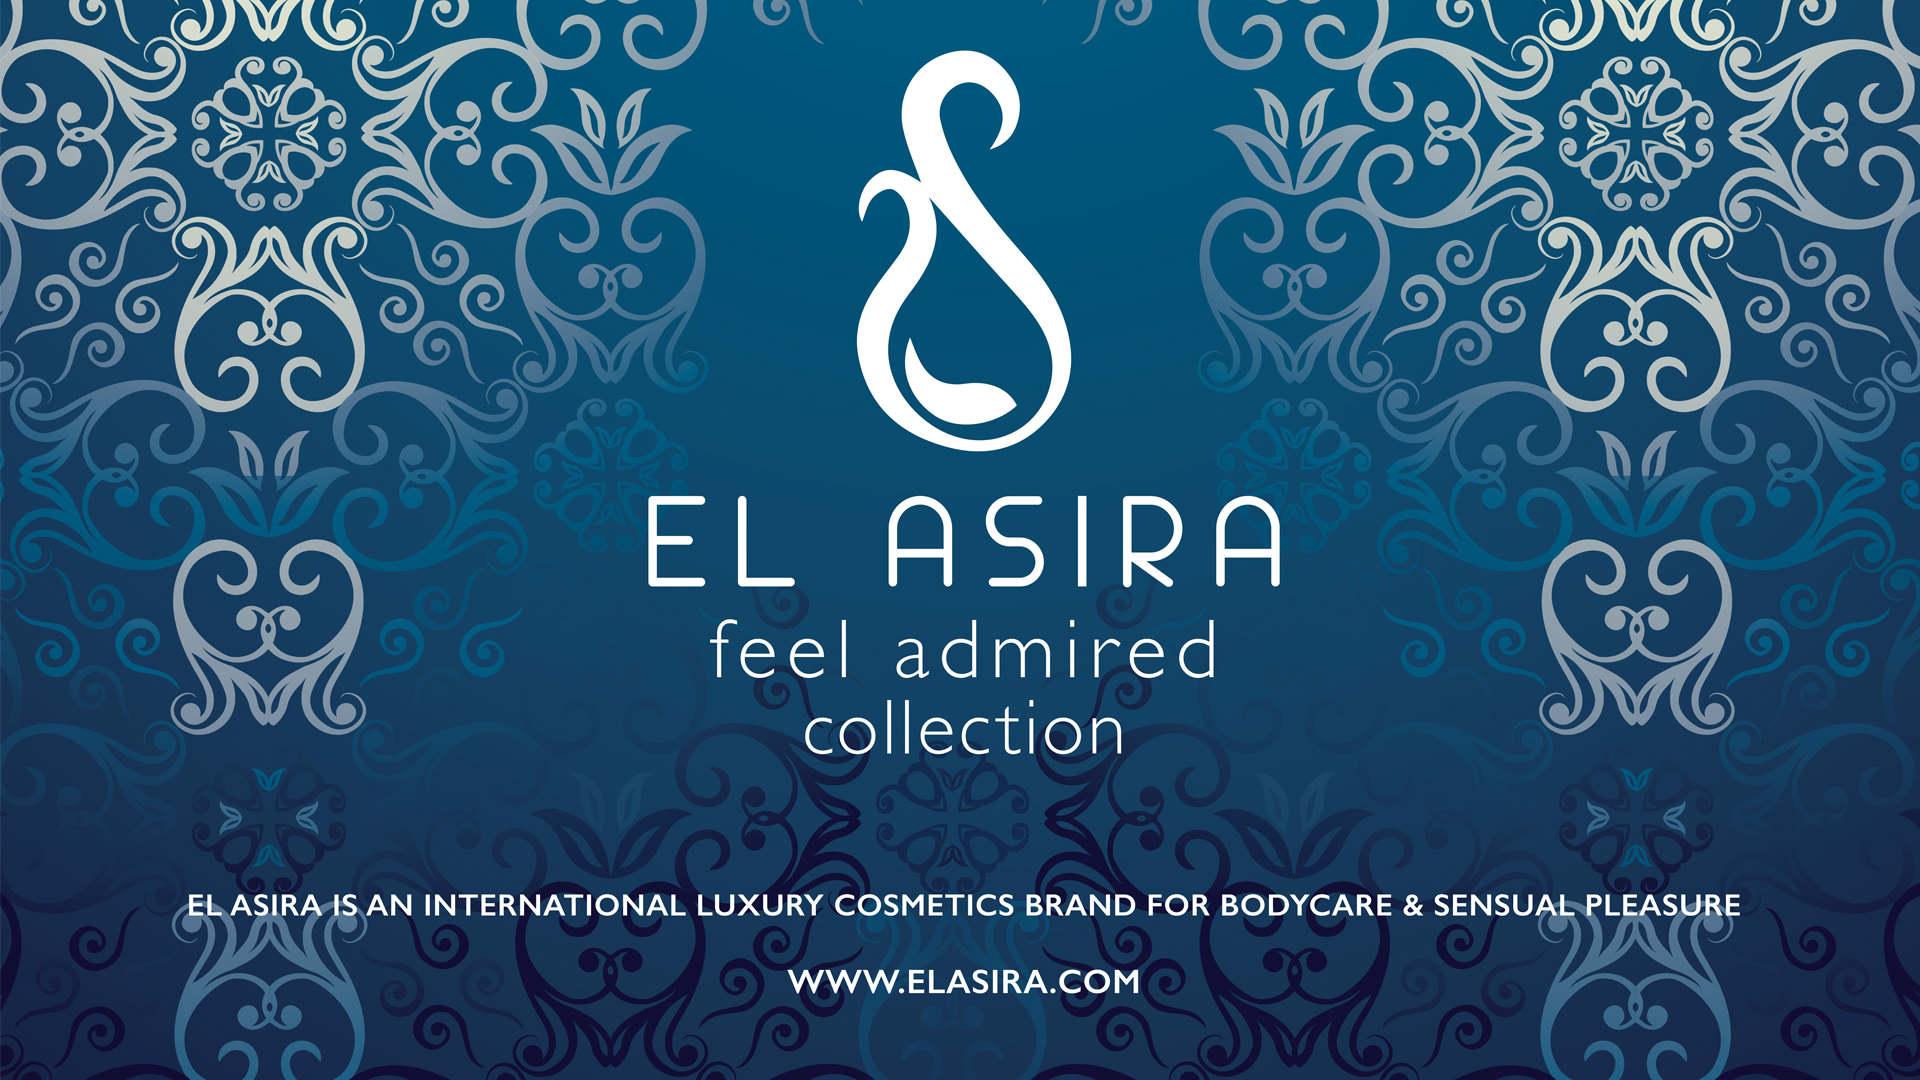 El Asira. Case. Visuals creatieve strategie, branding & identity, creative- & art direction, concept, design, packaging, e-commerce, positionering. Sham Ramessar